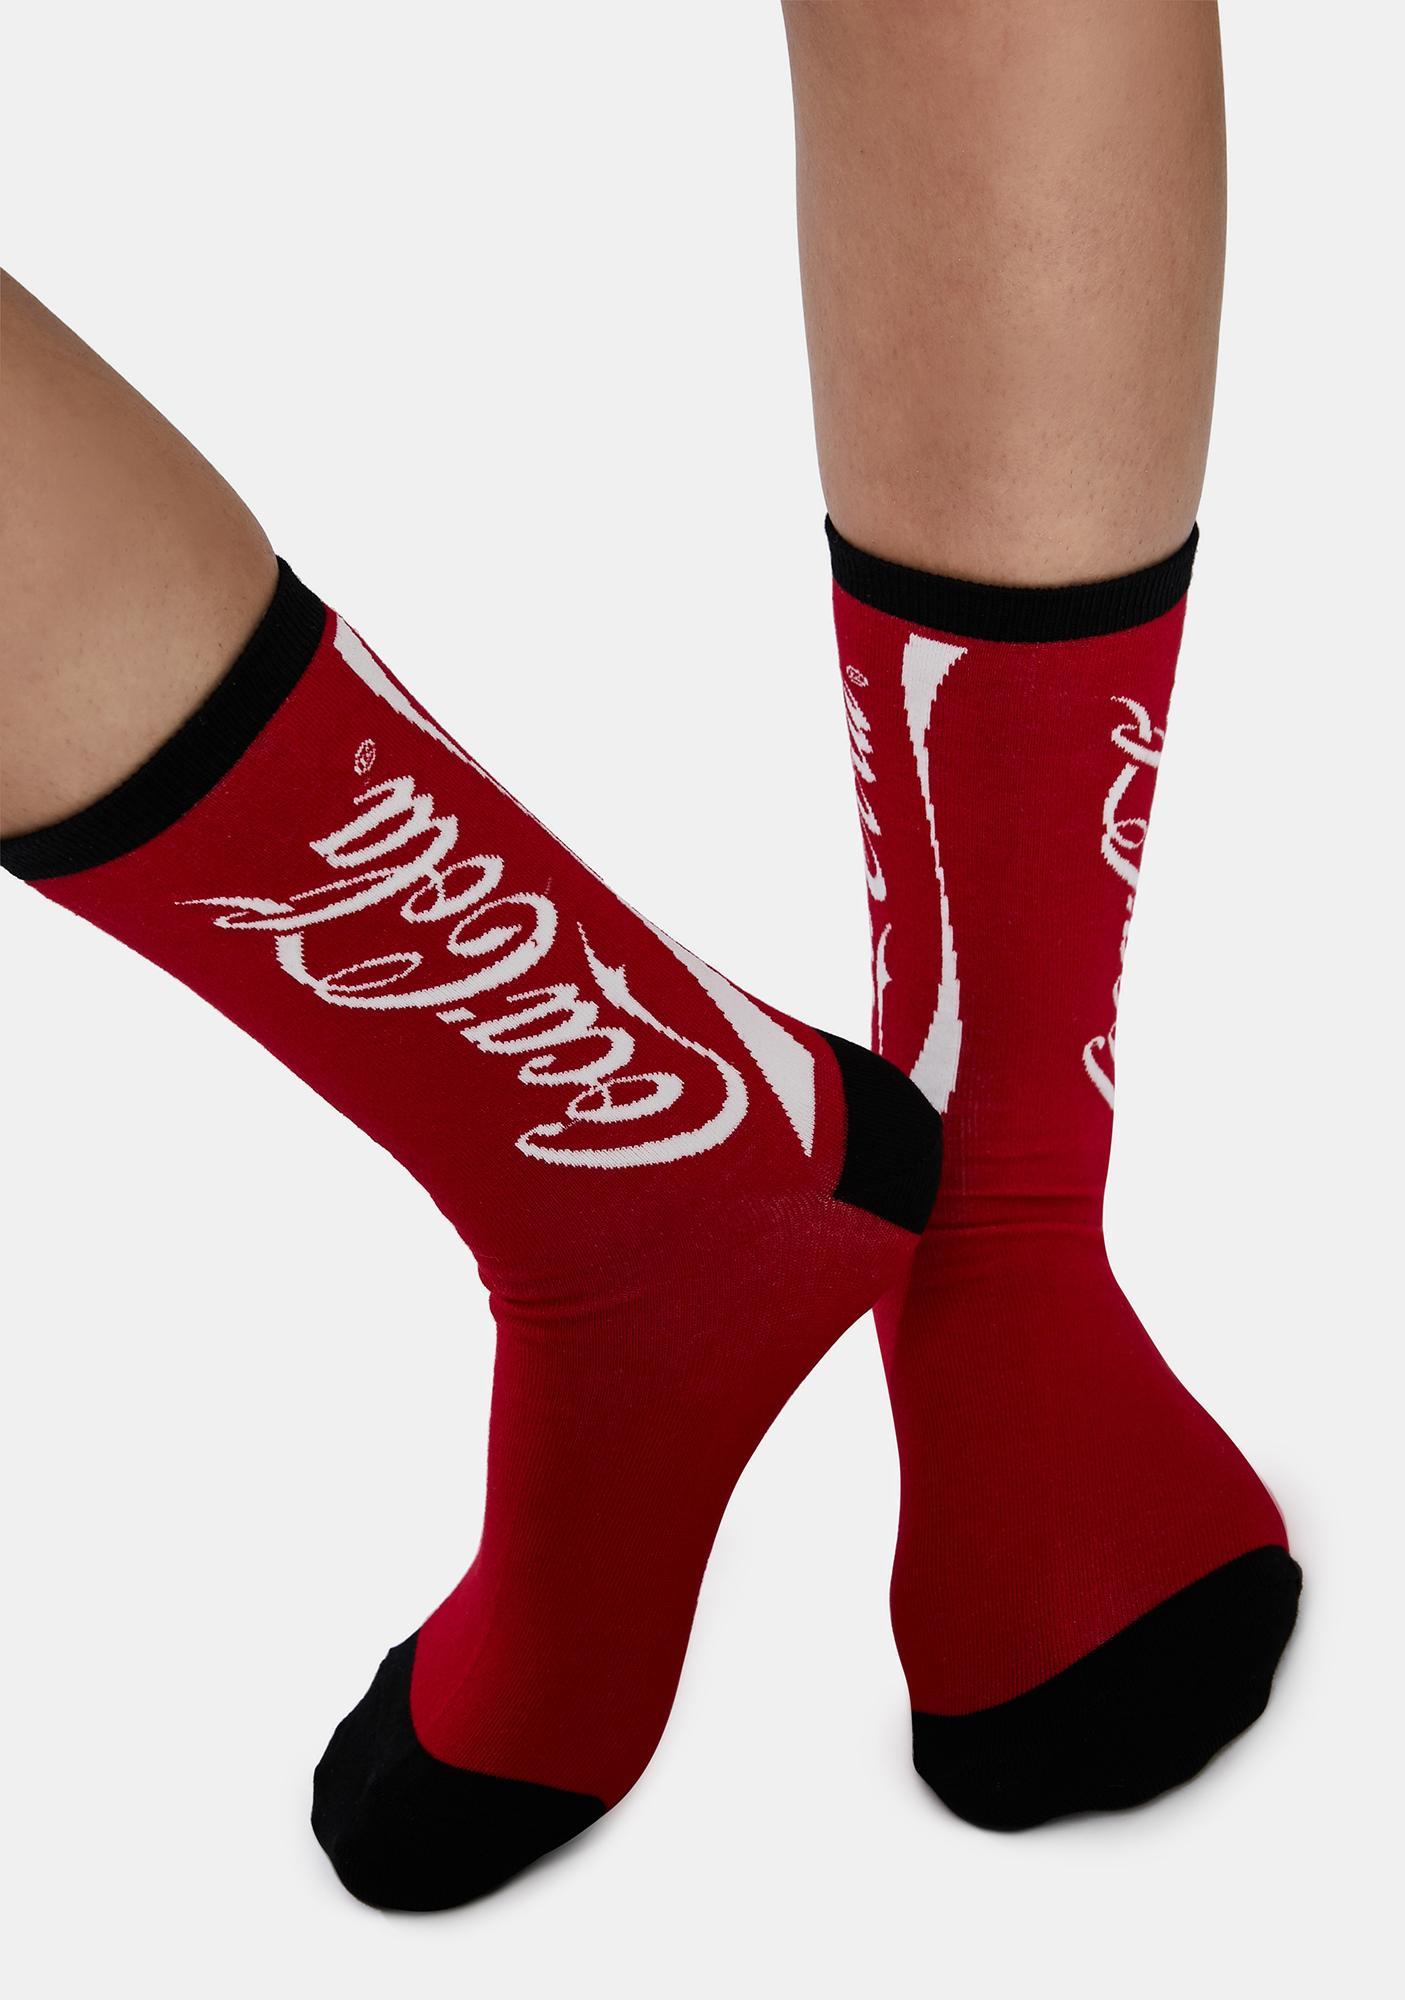 Socksmith Design Cherry Coca Cola Crew Socks